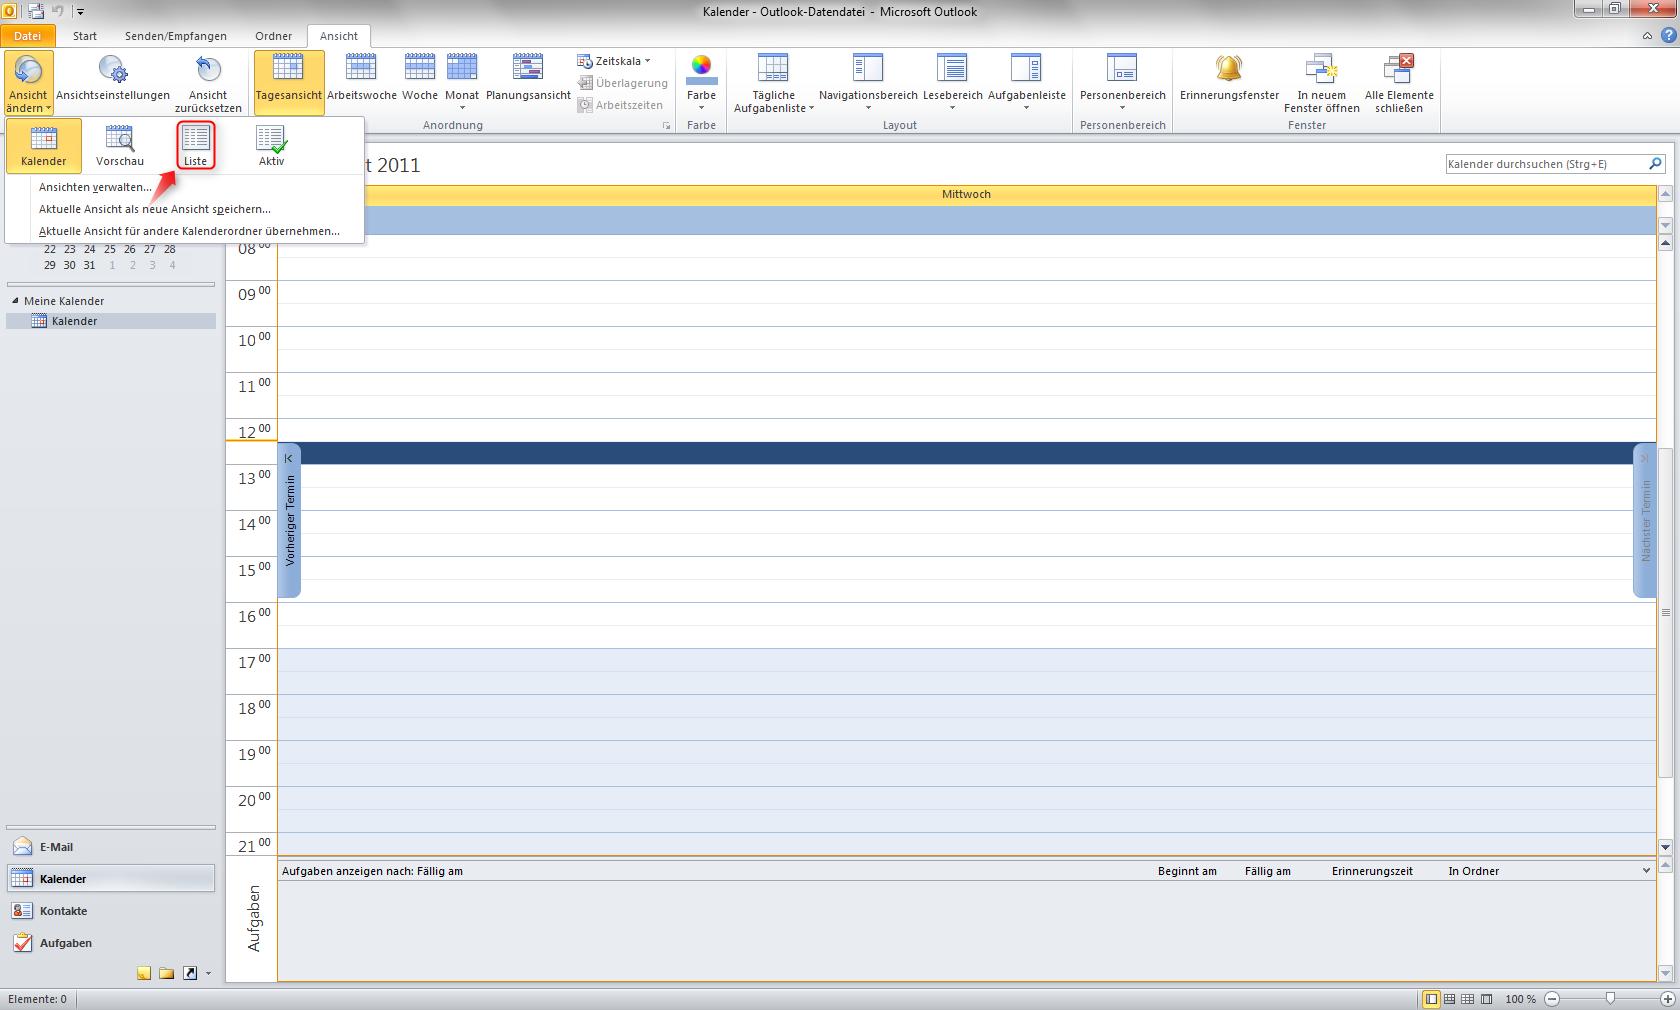 04-Outlook-2010-Kalendereintraege-entfernen-Ansicht-aendern-Liste-470.png?nocache=1312379476560